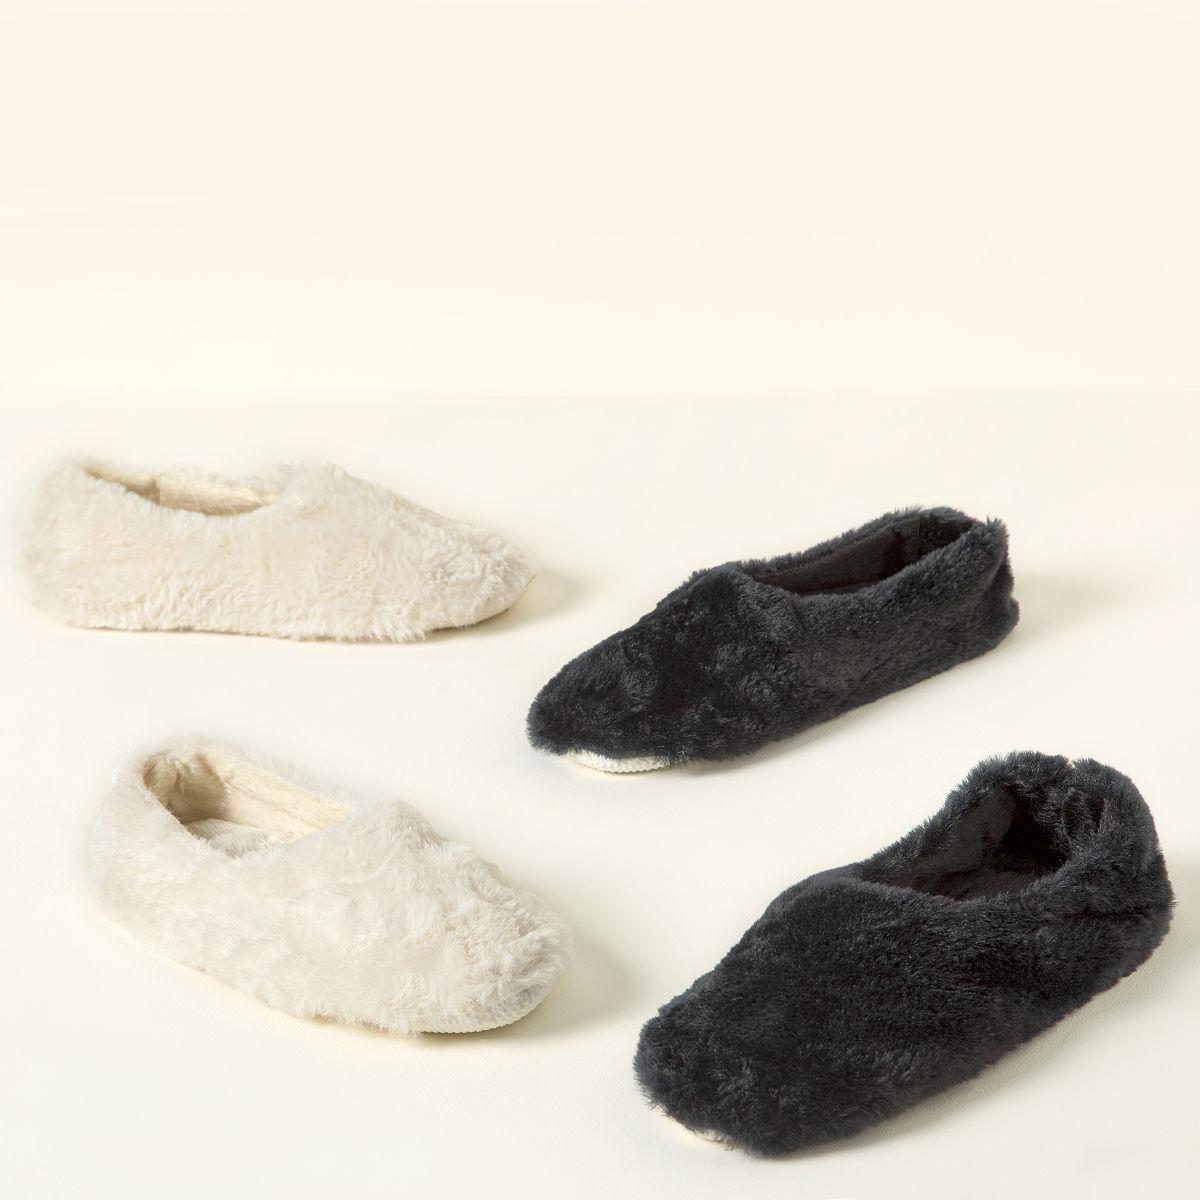 ballerina herbal warming slippers aromatherapy uncommongoods